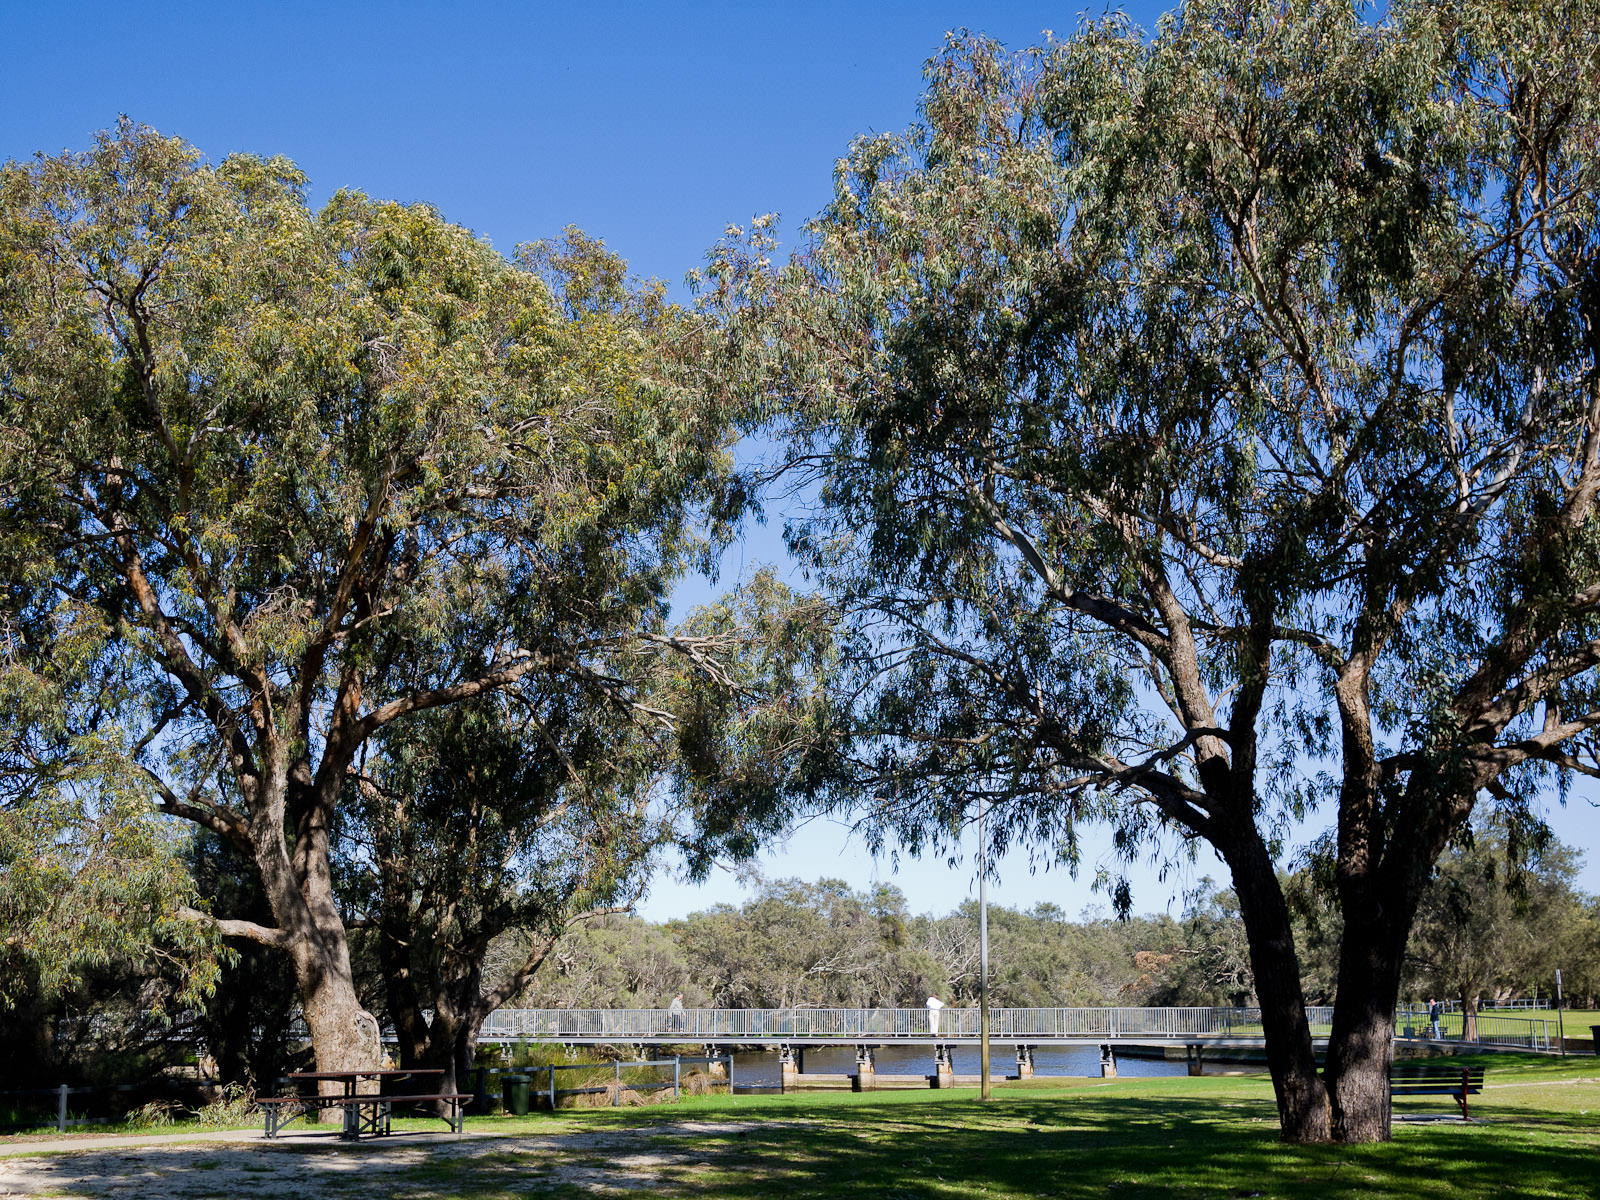 Canning River Regional Park